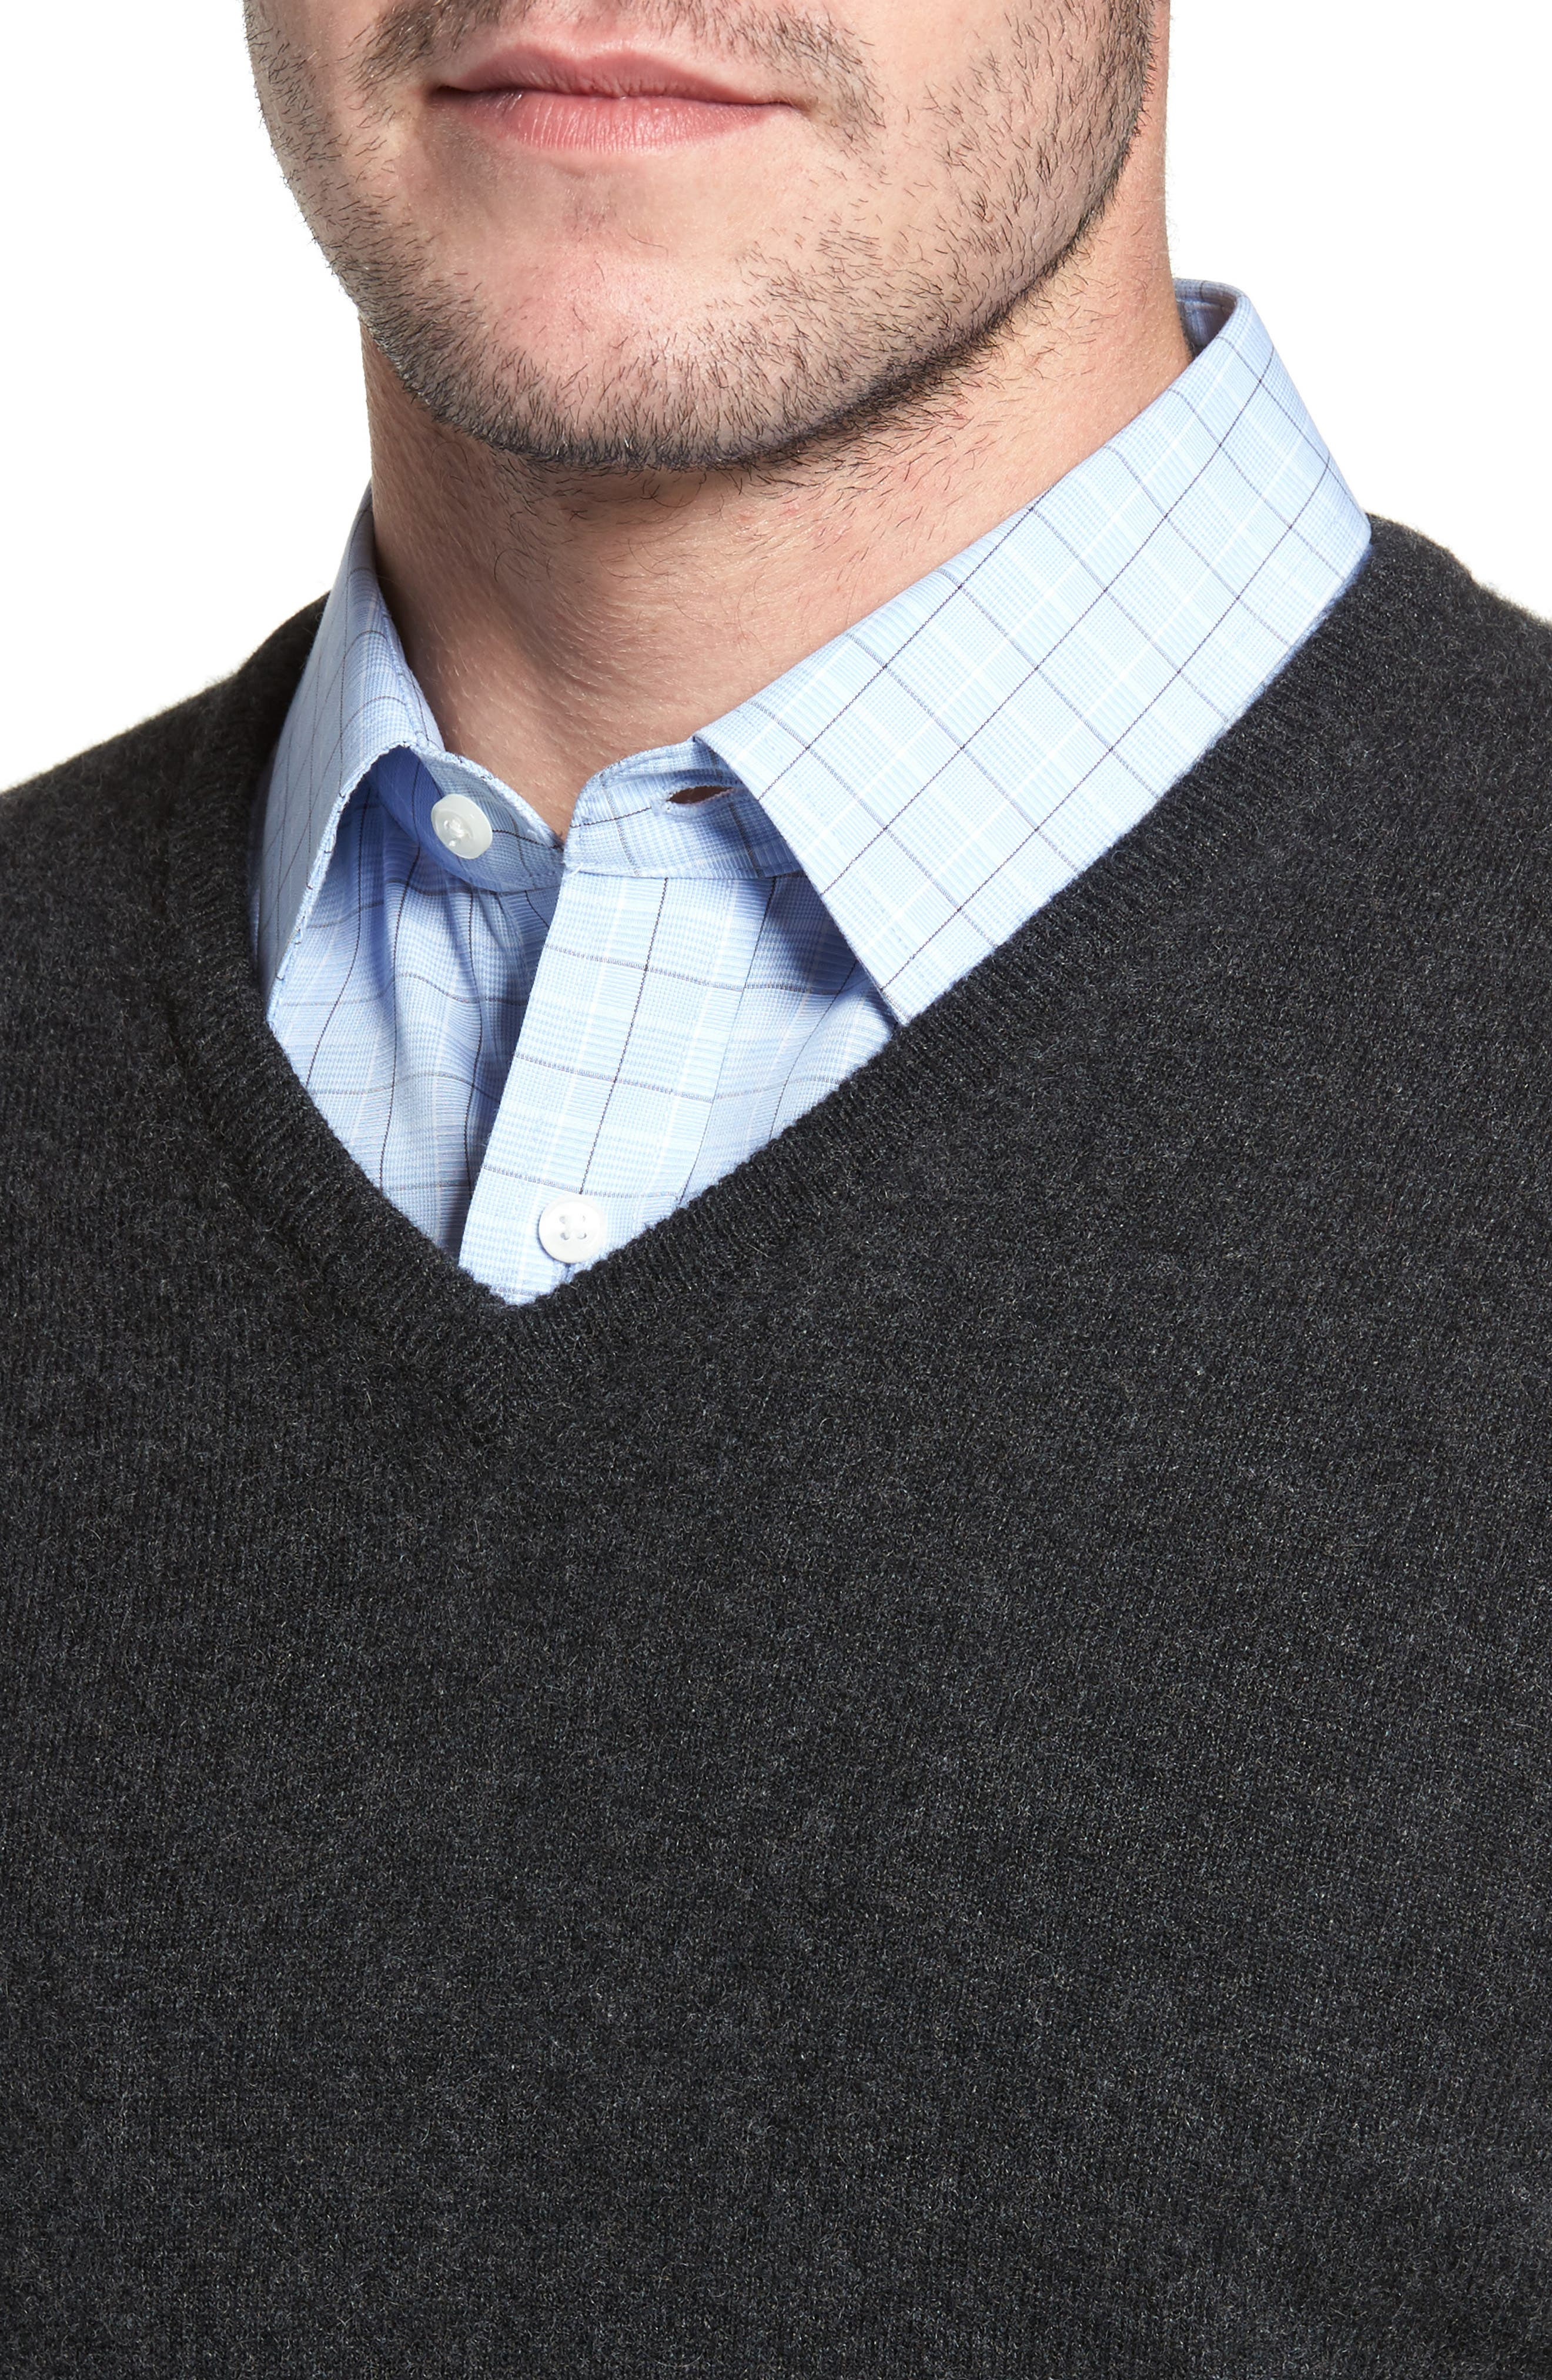 Cashmere V-Neck Sweater,                             Alternate thumbnail 19, color,